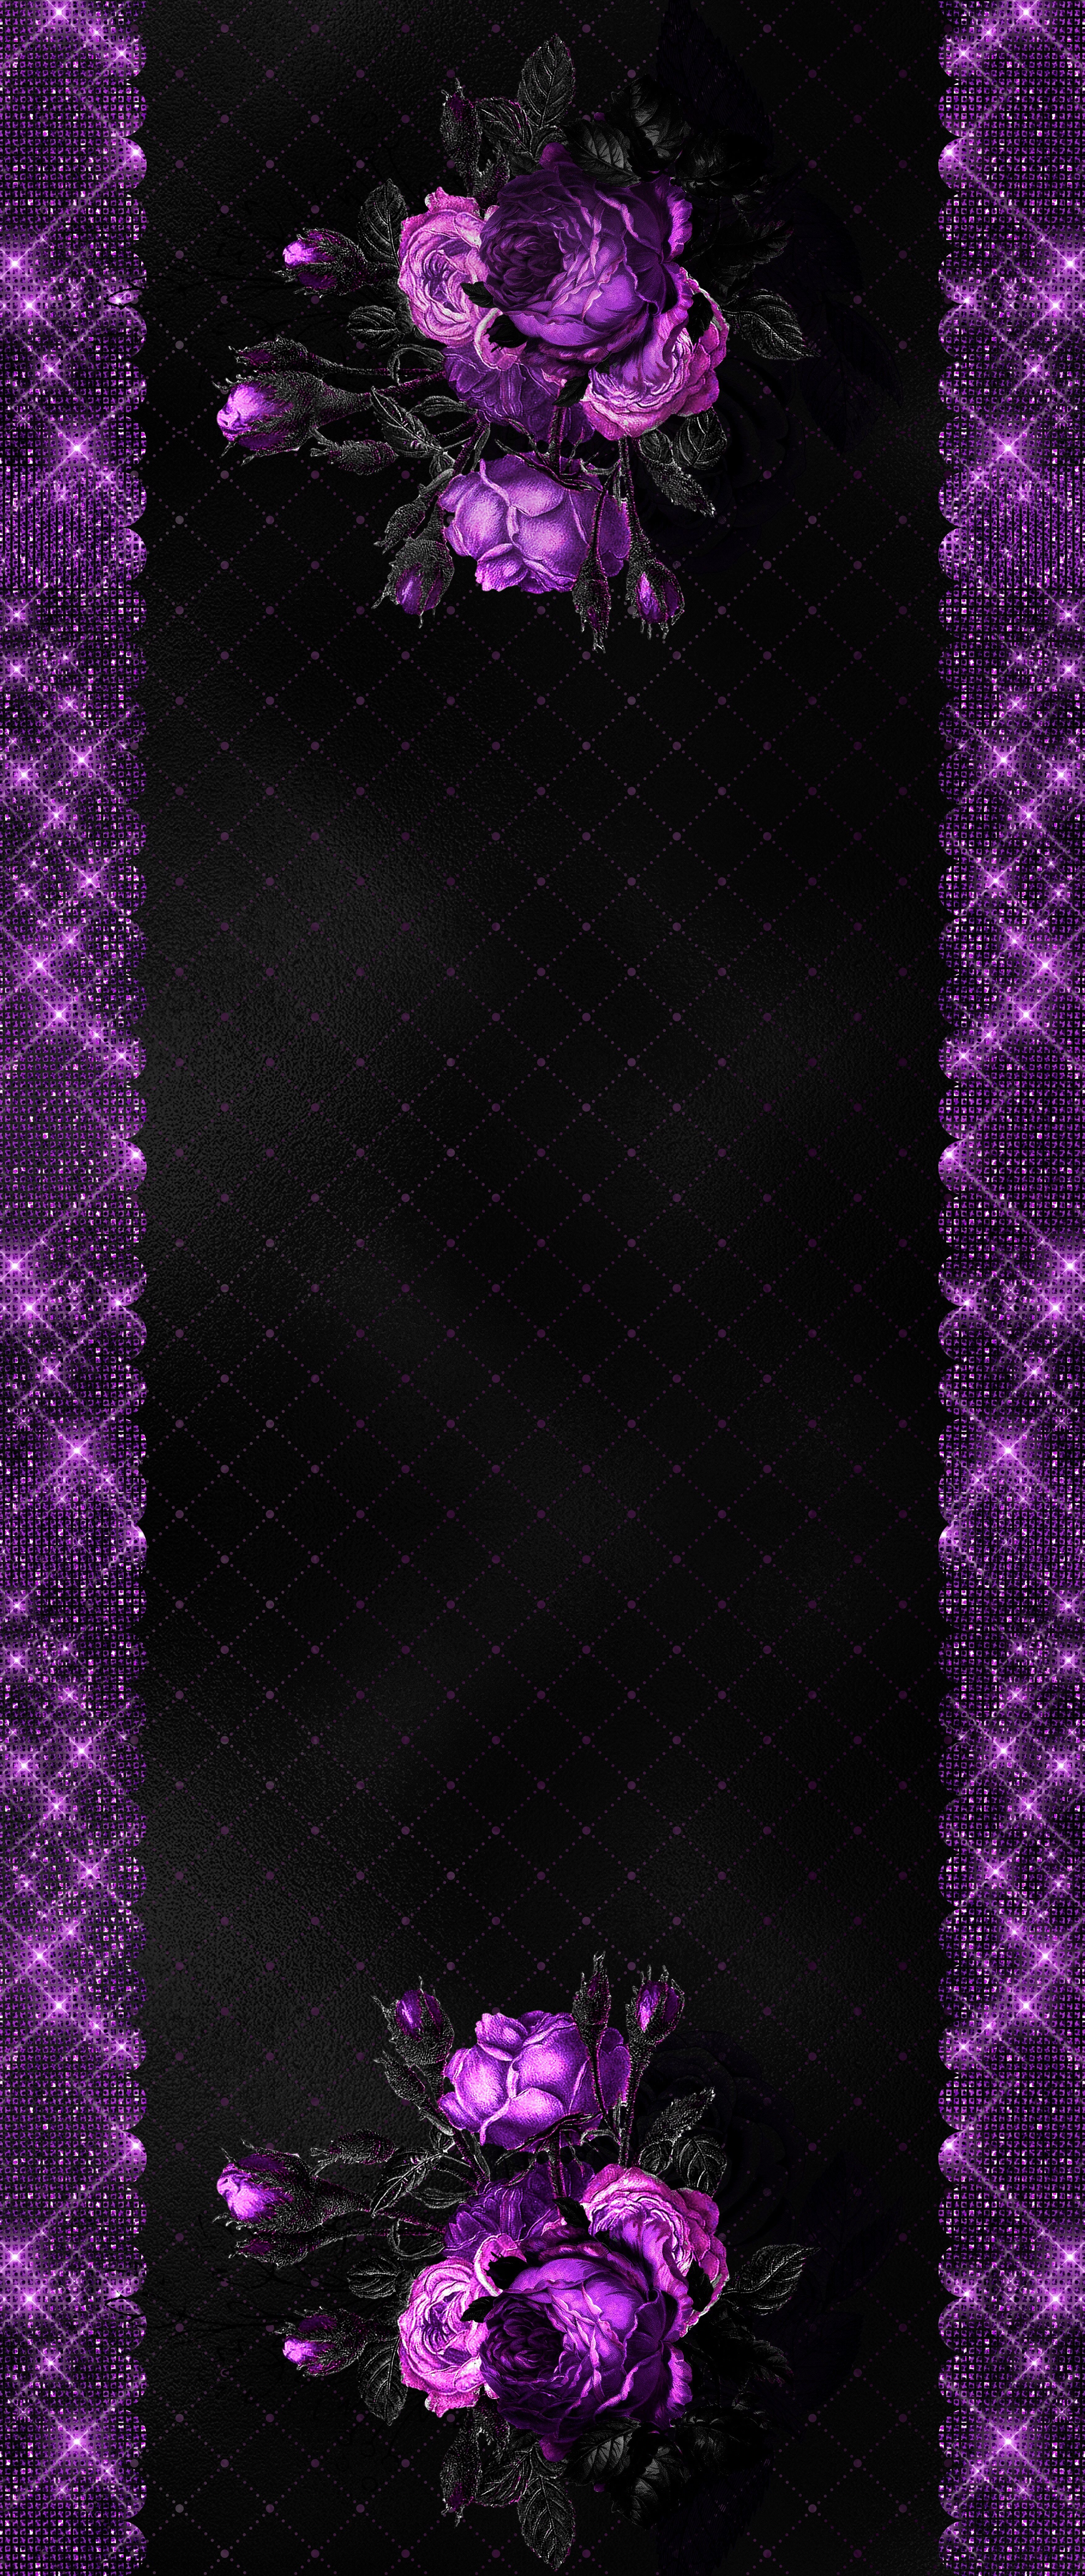 Aesthetic Black And Purple Hd Wallpaper Android Black And Purple Wallpaper Purple Wallpaper Purple Wallpaper Hd